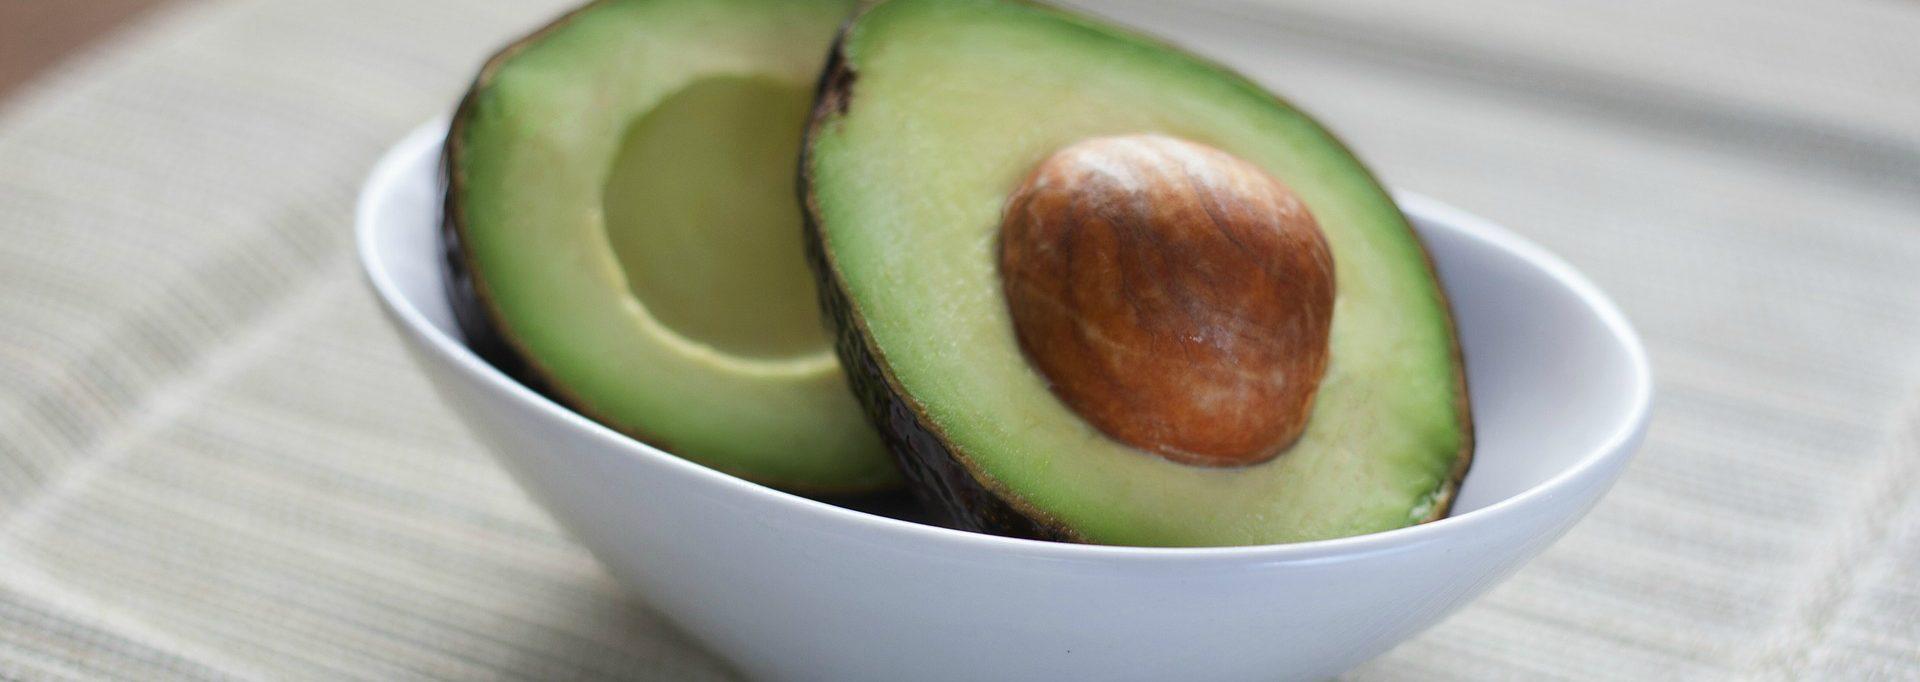 Avocado Beet Smoothie